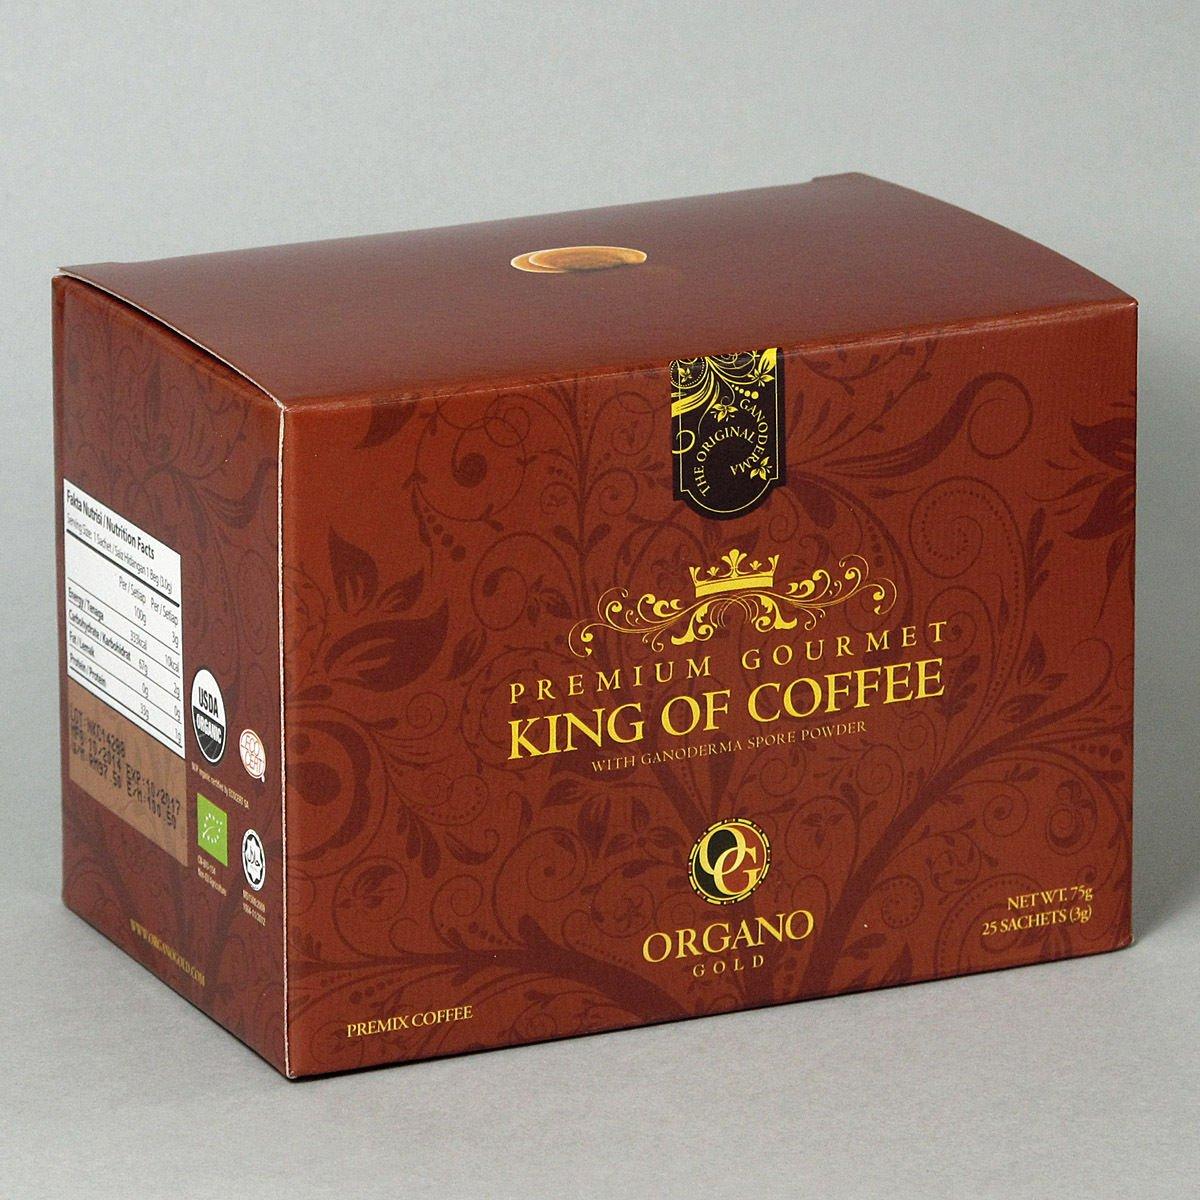 Organo Gold King of Coffee Premium - Café de alta calidad (25 bolsitas por caja) - 1